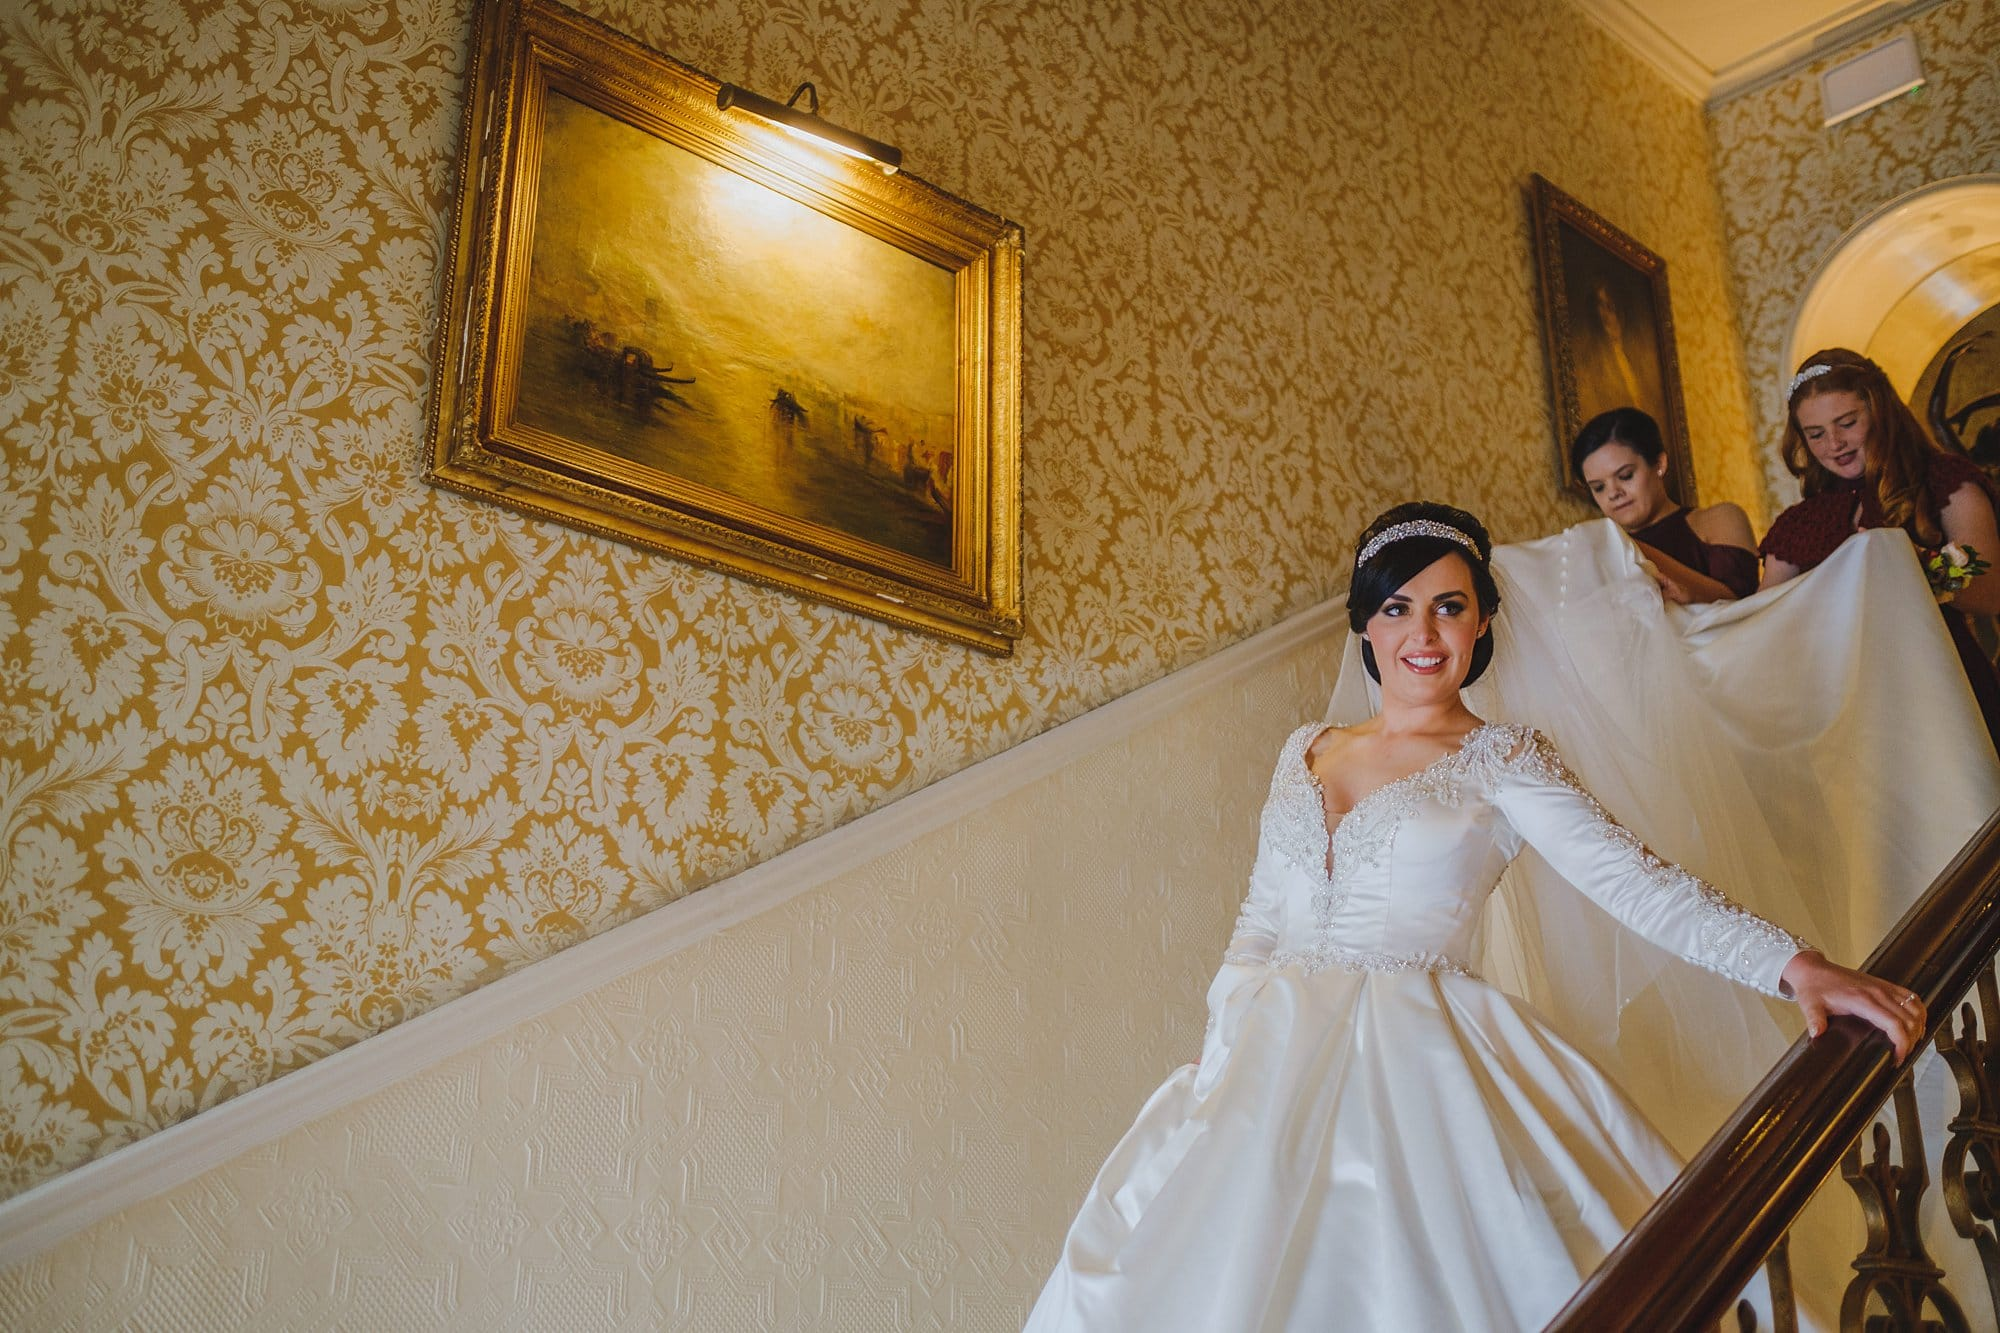 strawberry hill house wedding photographer cc 020 - Strawberry Hill House Wedding Photographer | Charlotte + Cristiano